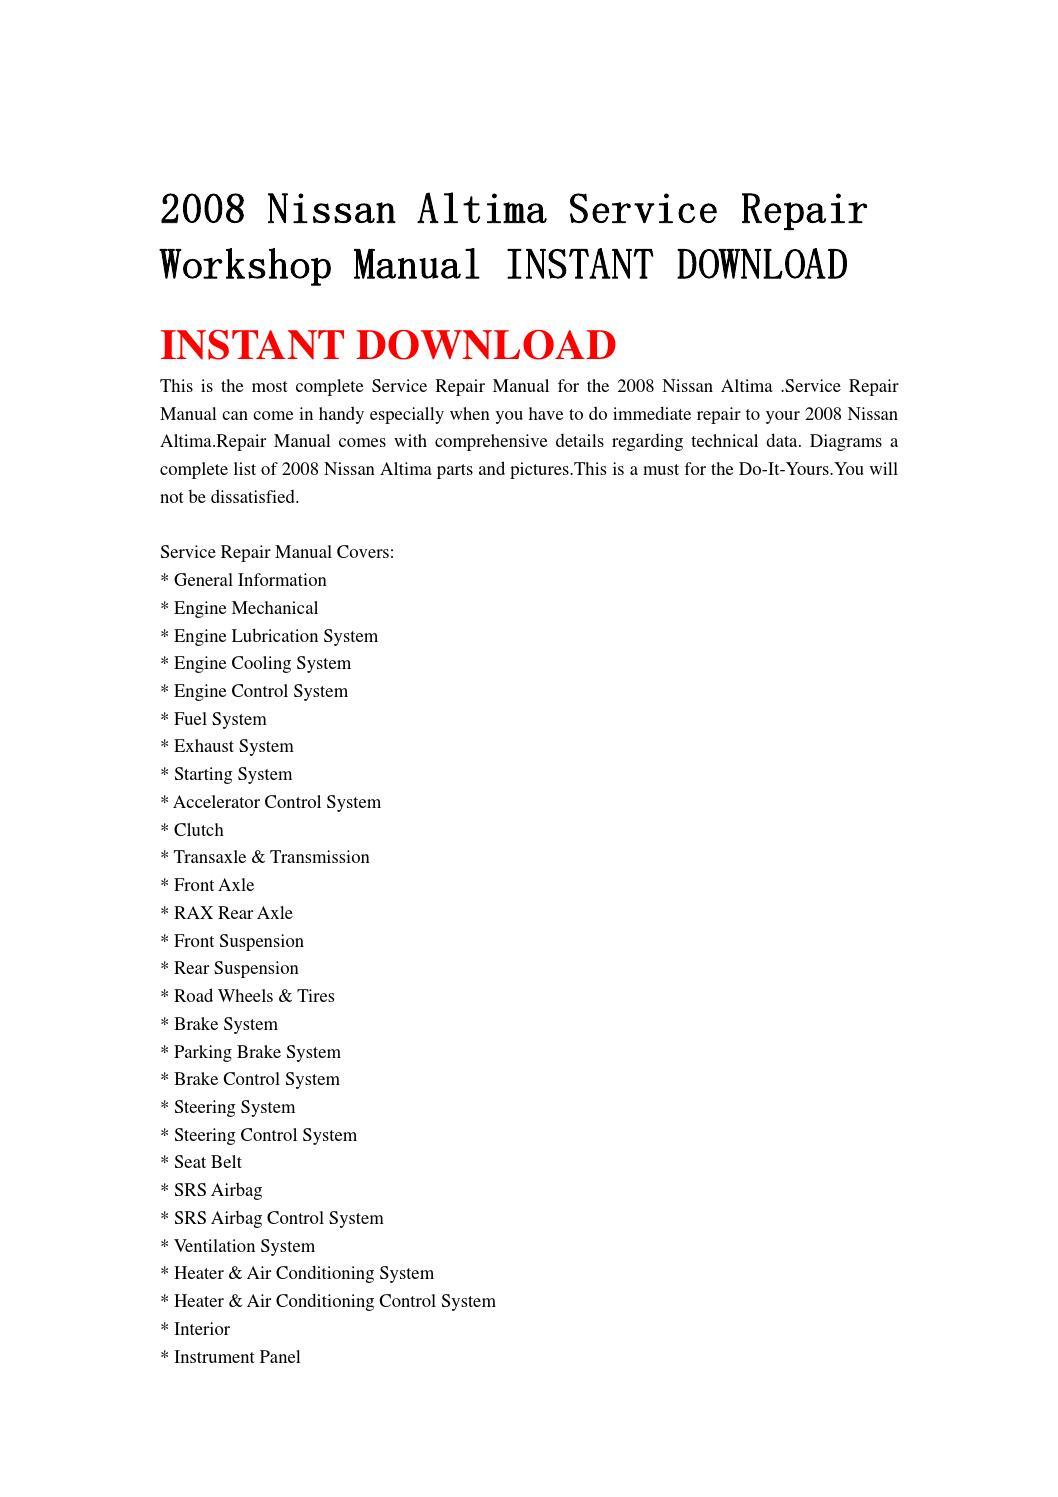 2008 nissan altima service repair workshop manual instant download rh issuu com 2007 nissan altima repair manual 2006 nissan altima repair manual free